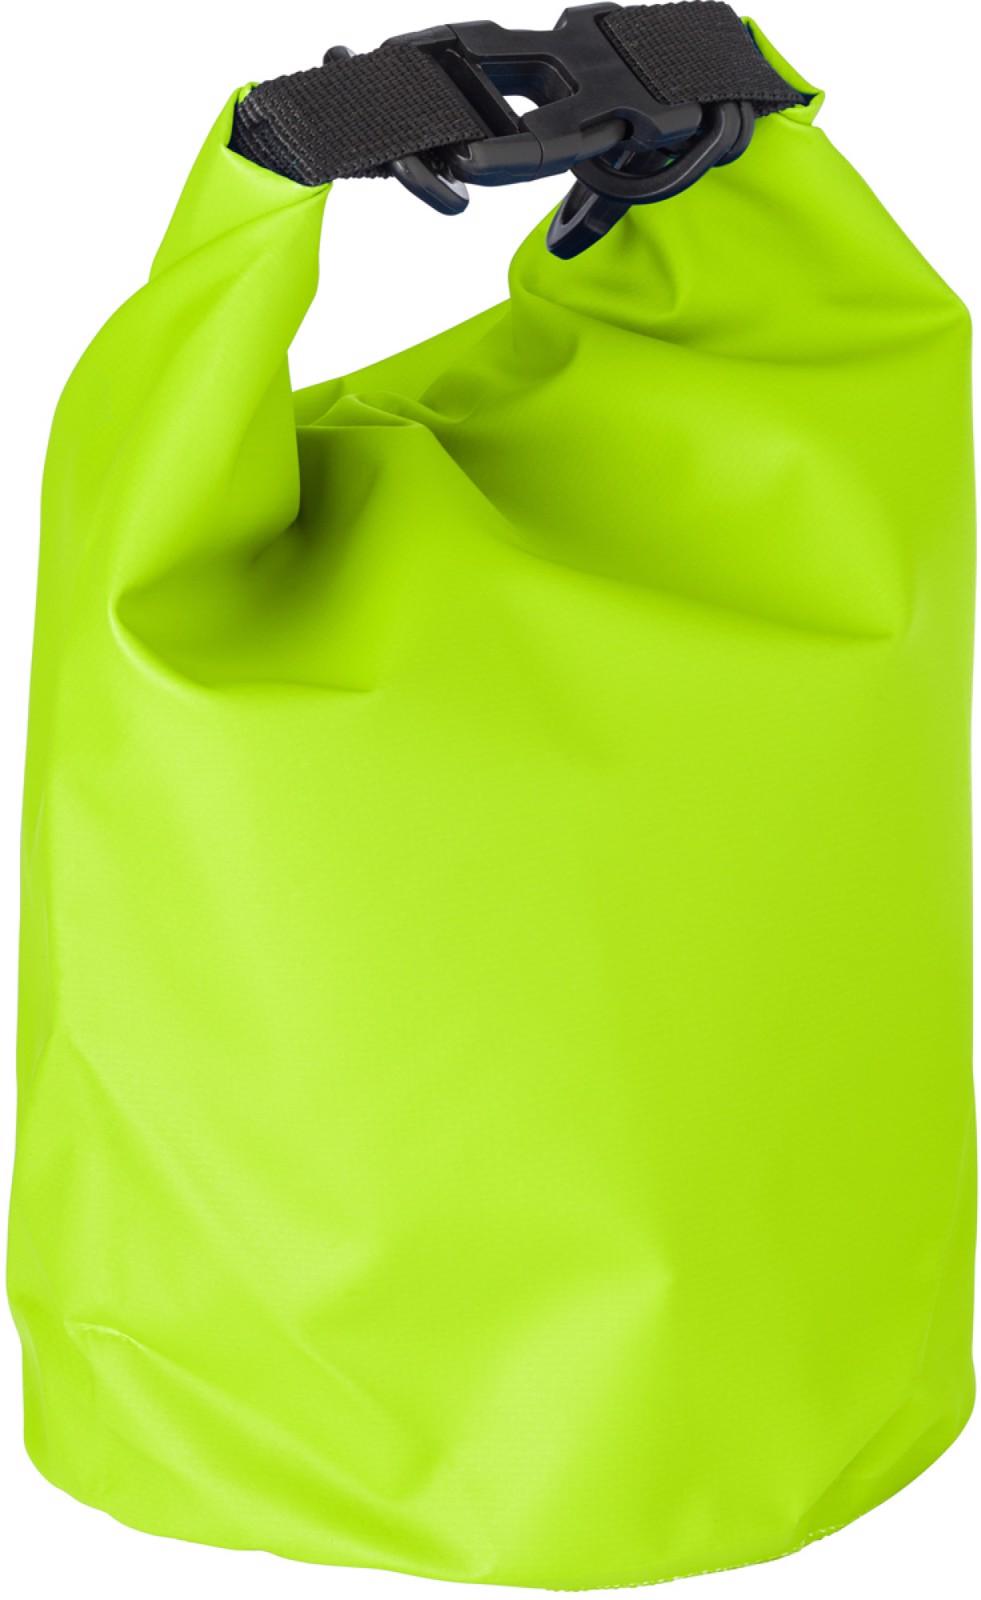 PVC watertight bag - Lime